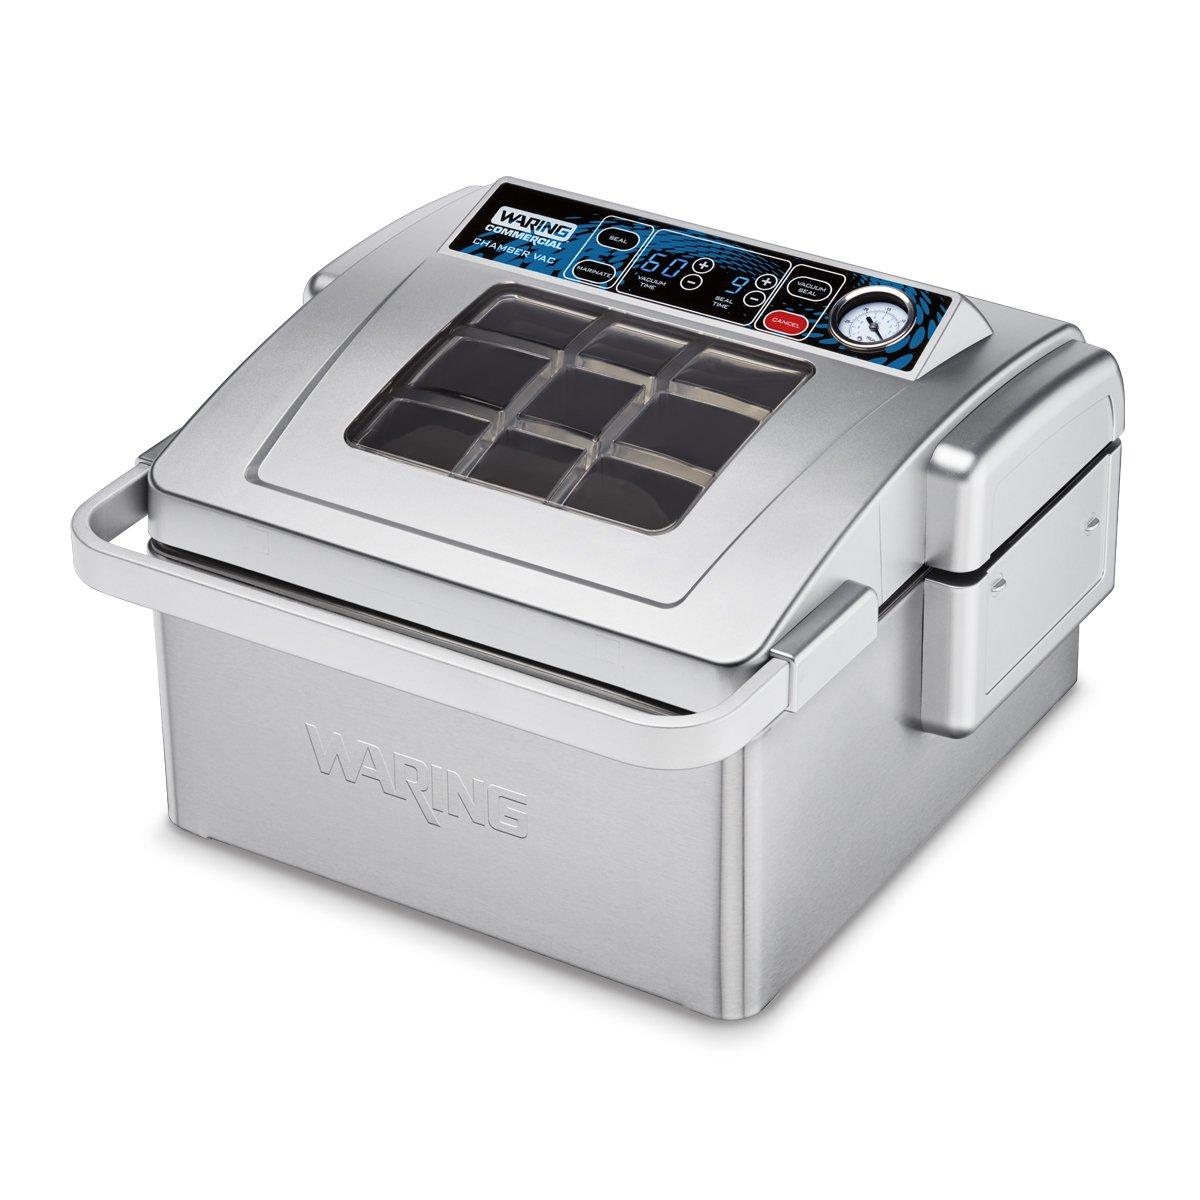 Waring Commercial WCV300 Vacuum Sealer, Silver